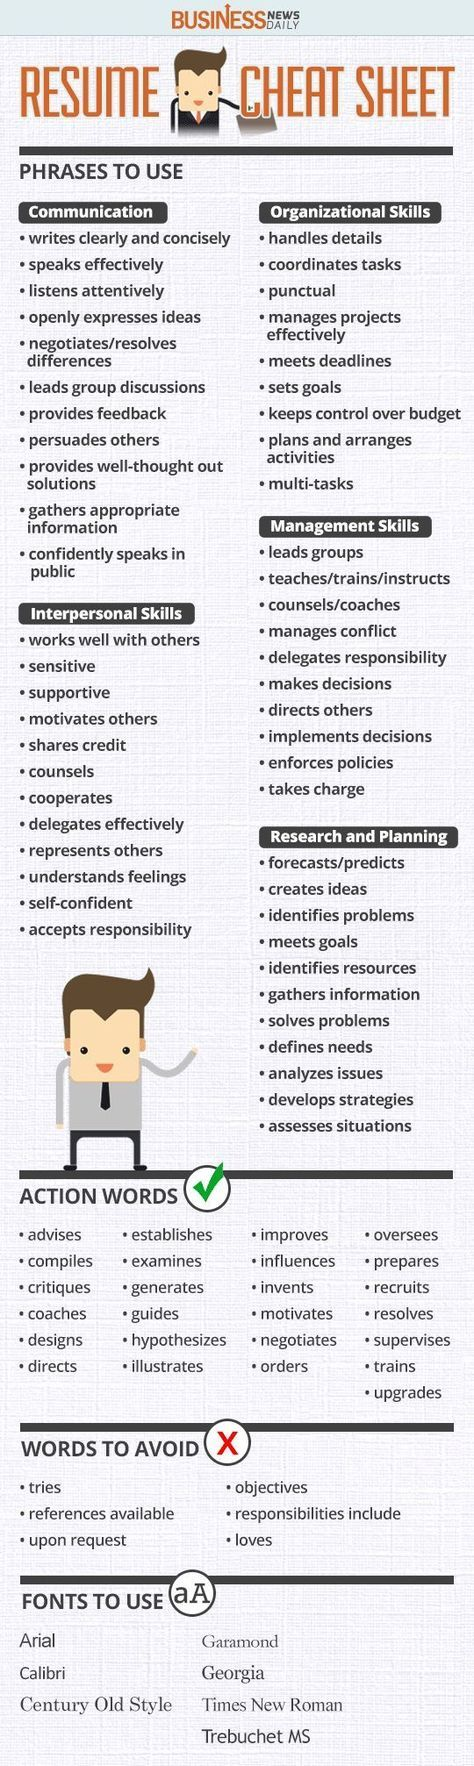 infographic   resume cheat sheet work business job